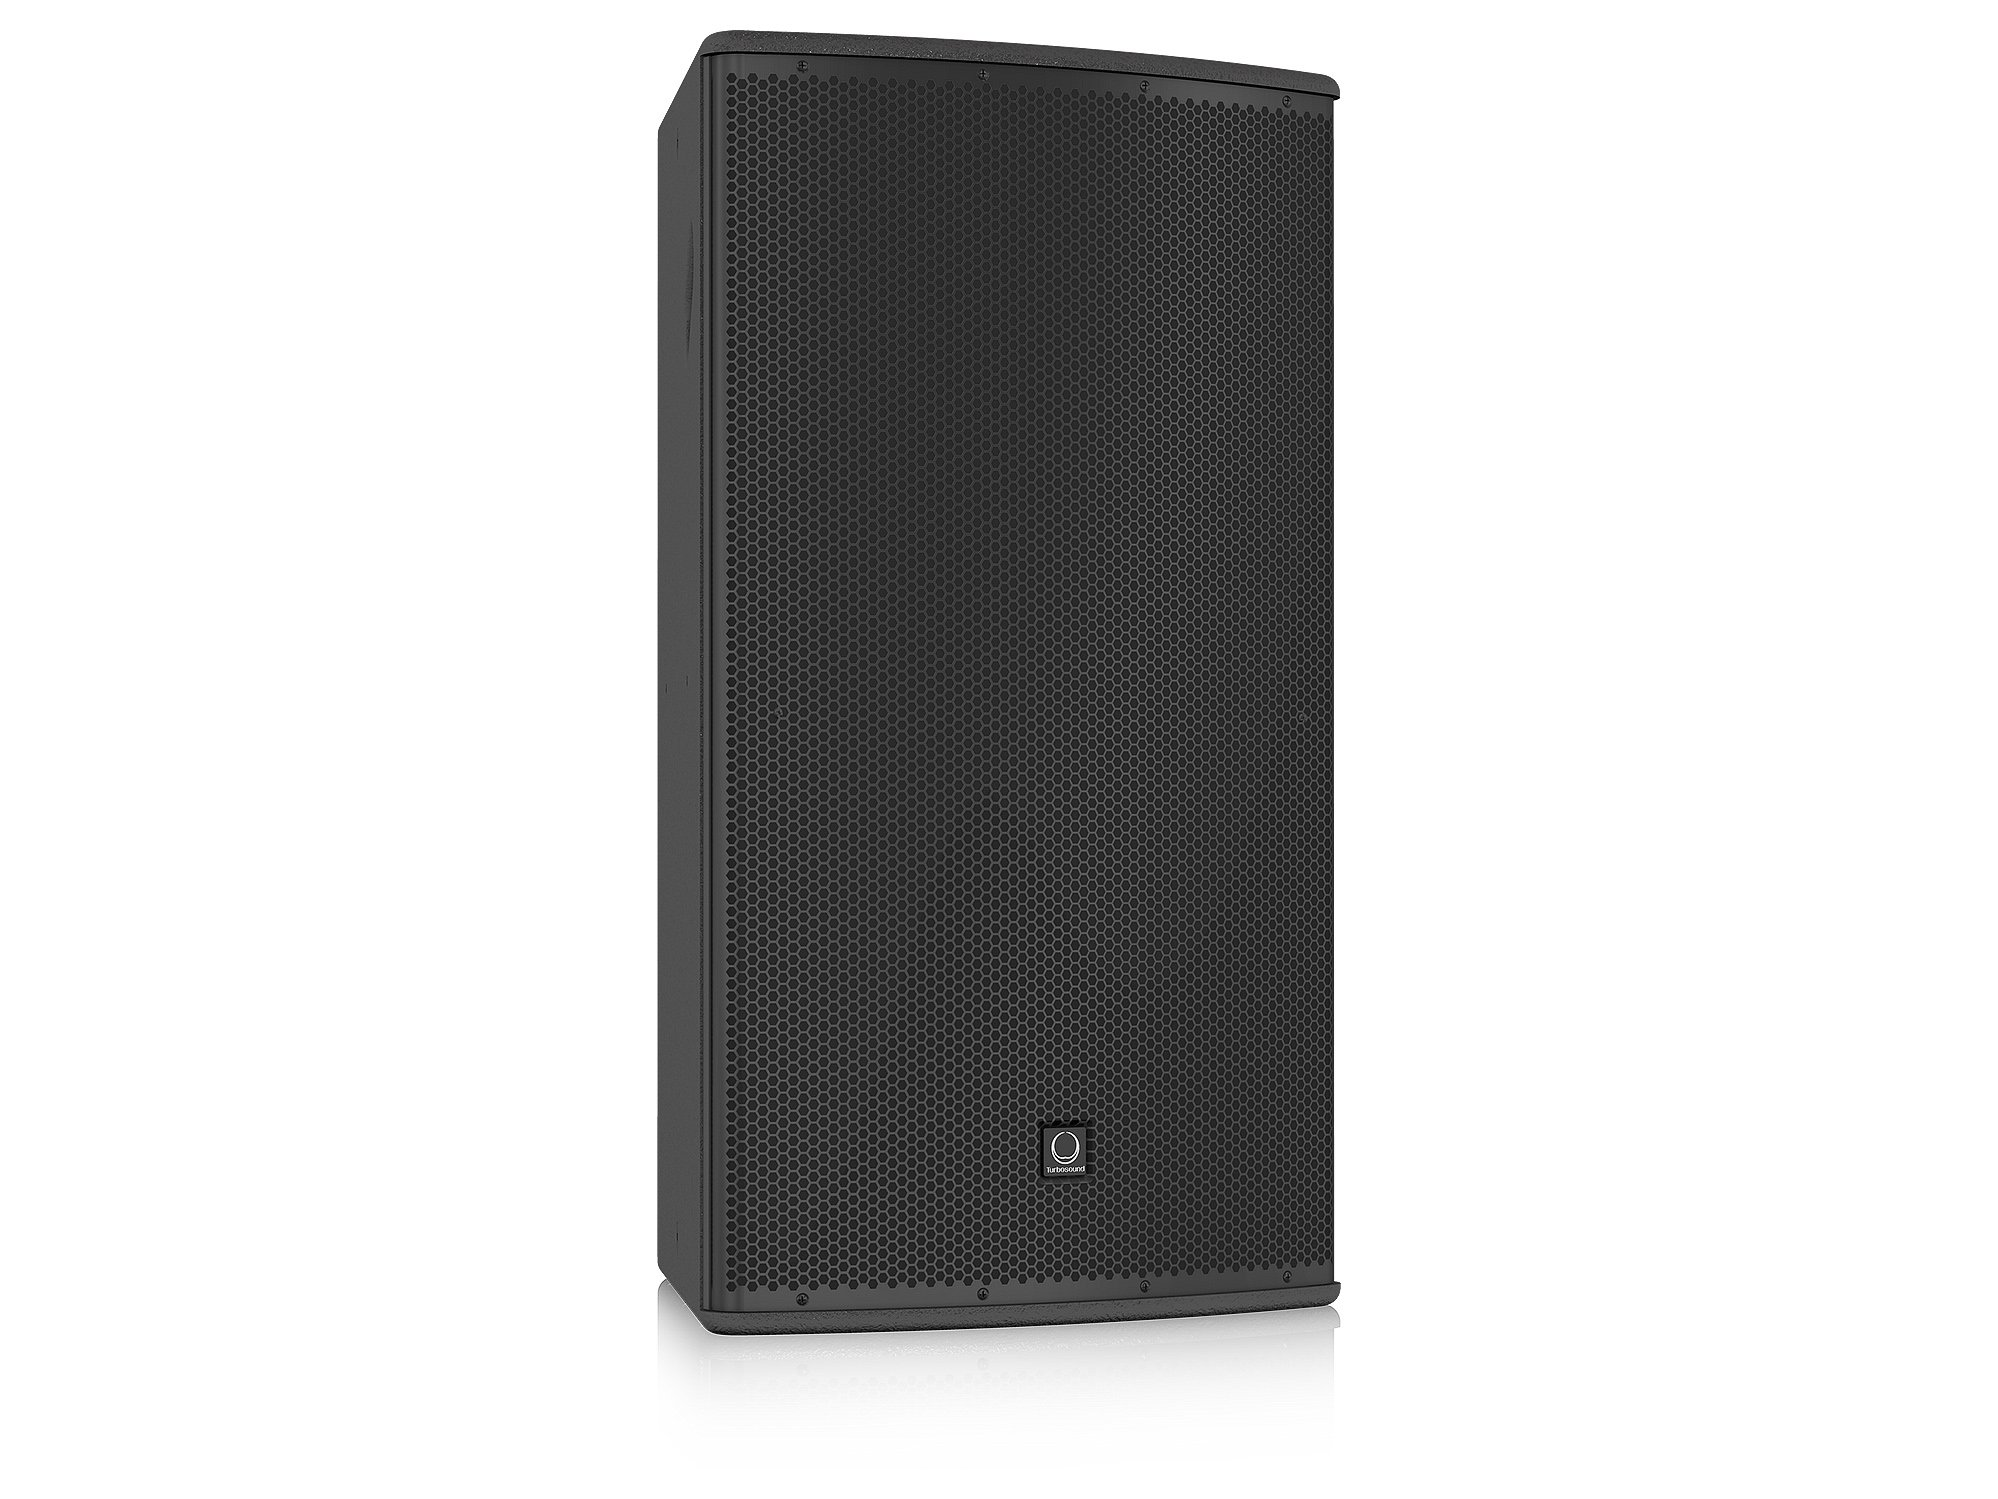 "15"" 500W (8 Ohms) 2-Way Full-Range Passive/Bi-Amp Loudspeaker with Klark Teknik DSP, ULTRANET Networking, and 90°x60° Dispersion in Black"